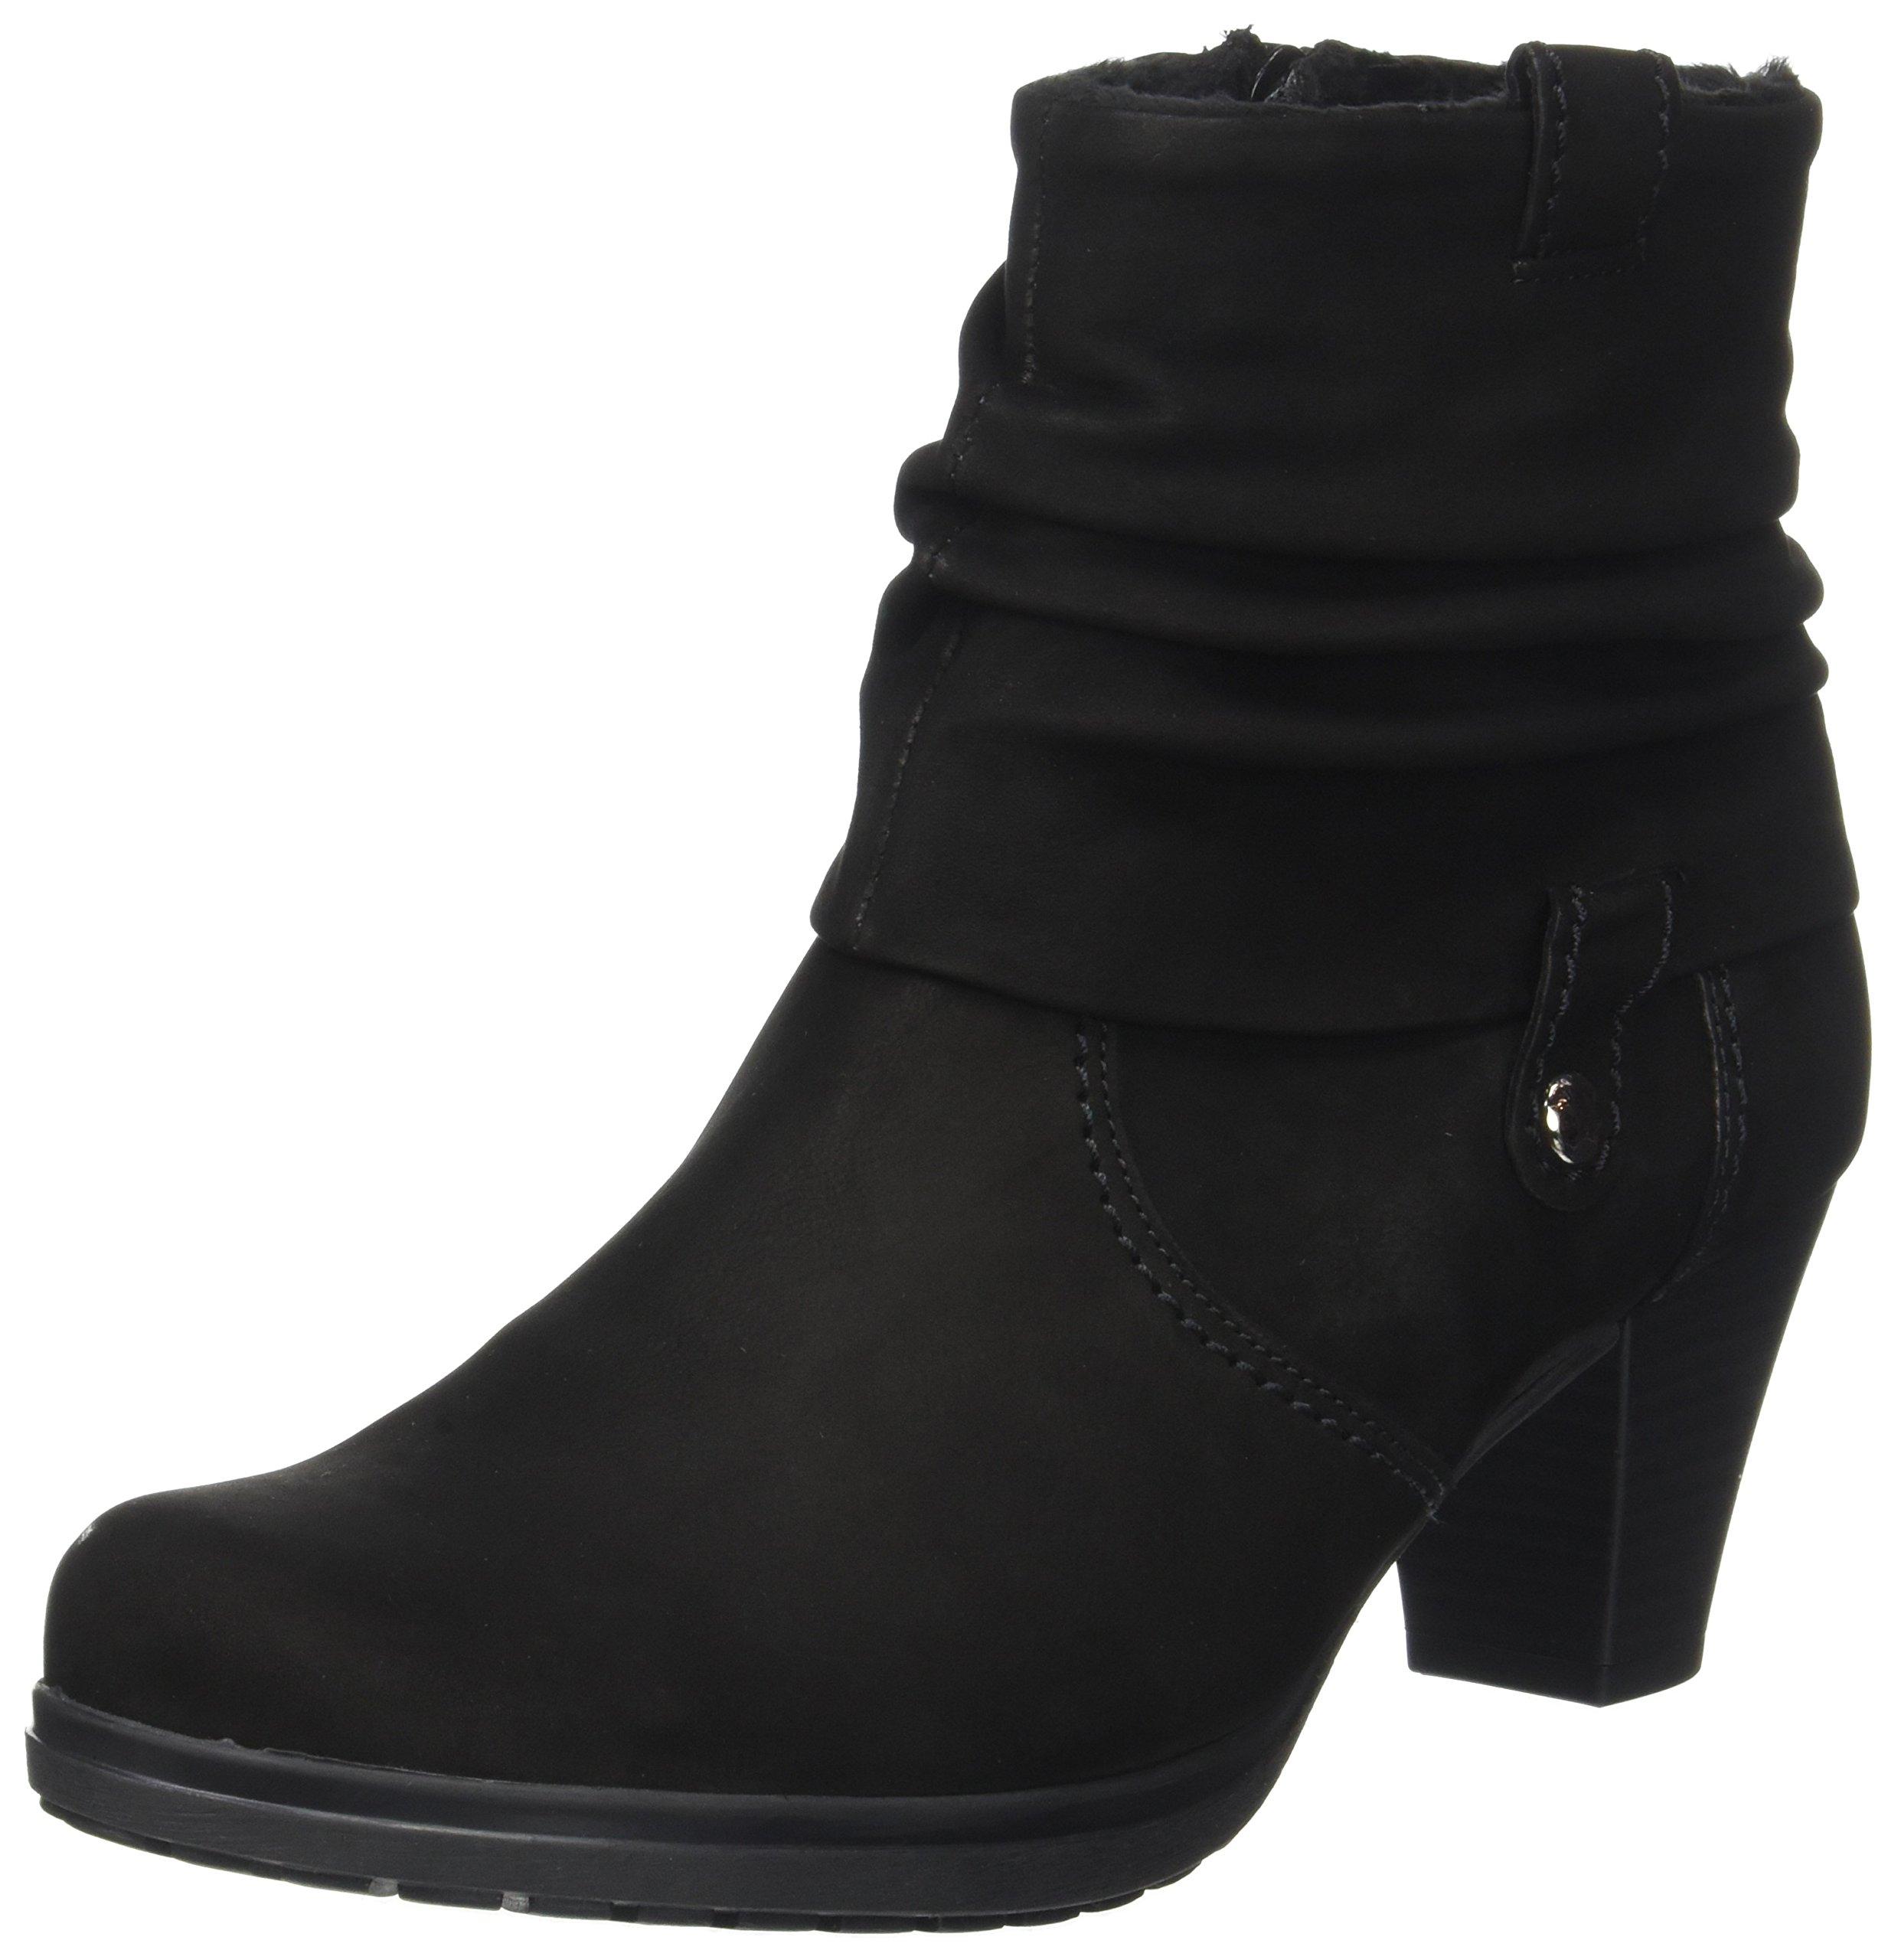 5 FemmeNoirschwarznickif35 BasicBottes Eu Gabor Shoes Comfort cJlFKuT351